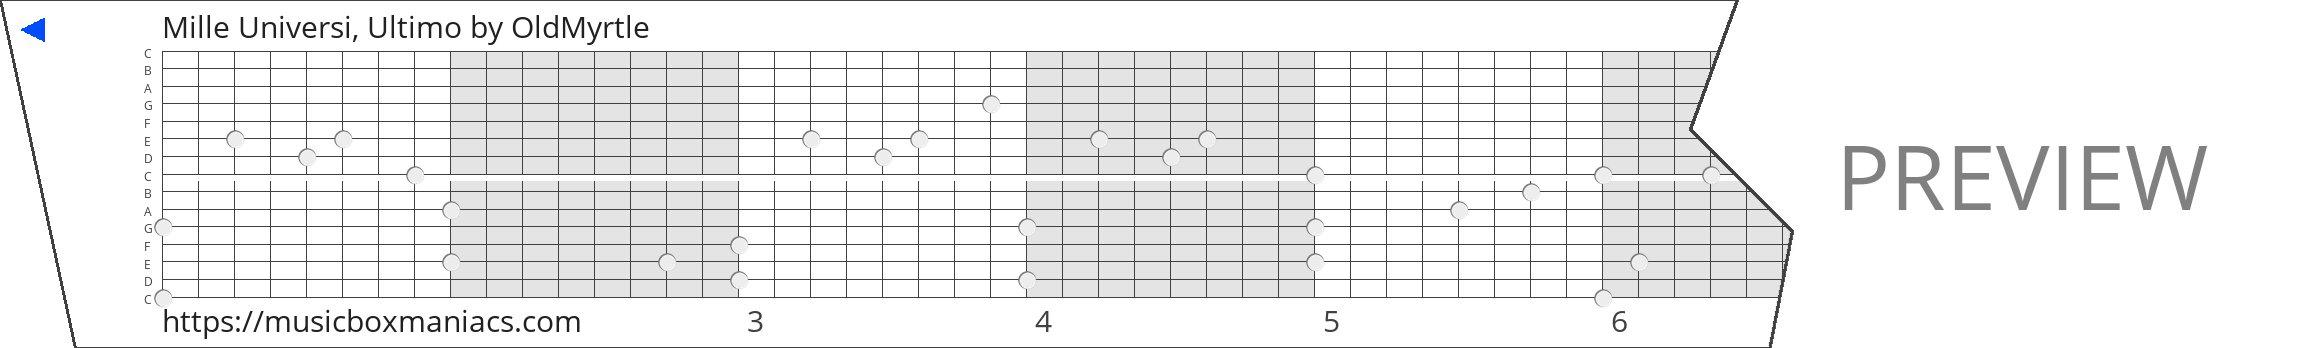 Mille Universi, Ultimo 15 note music box paper strip